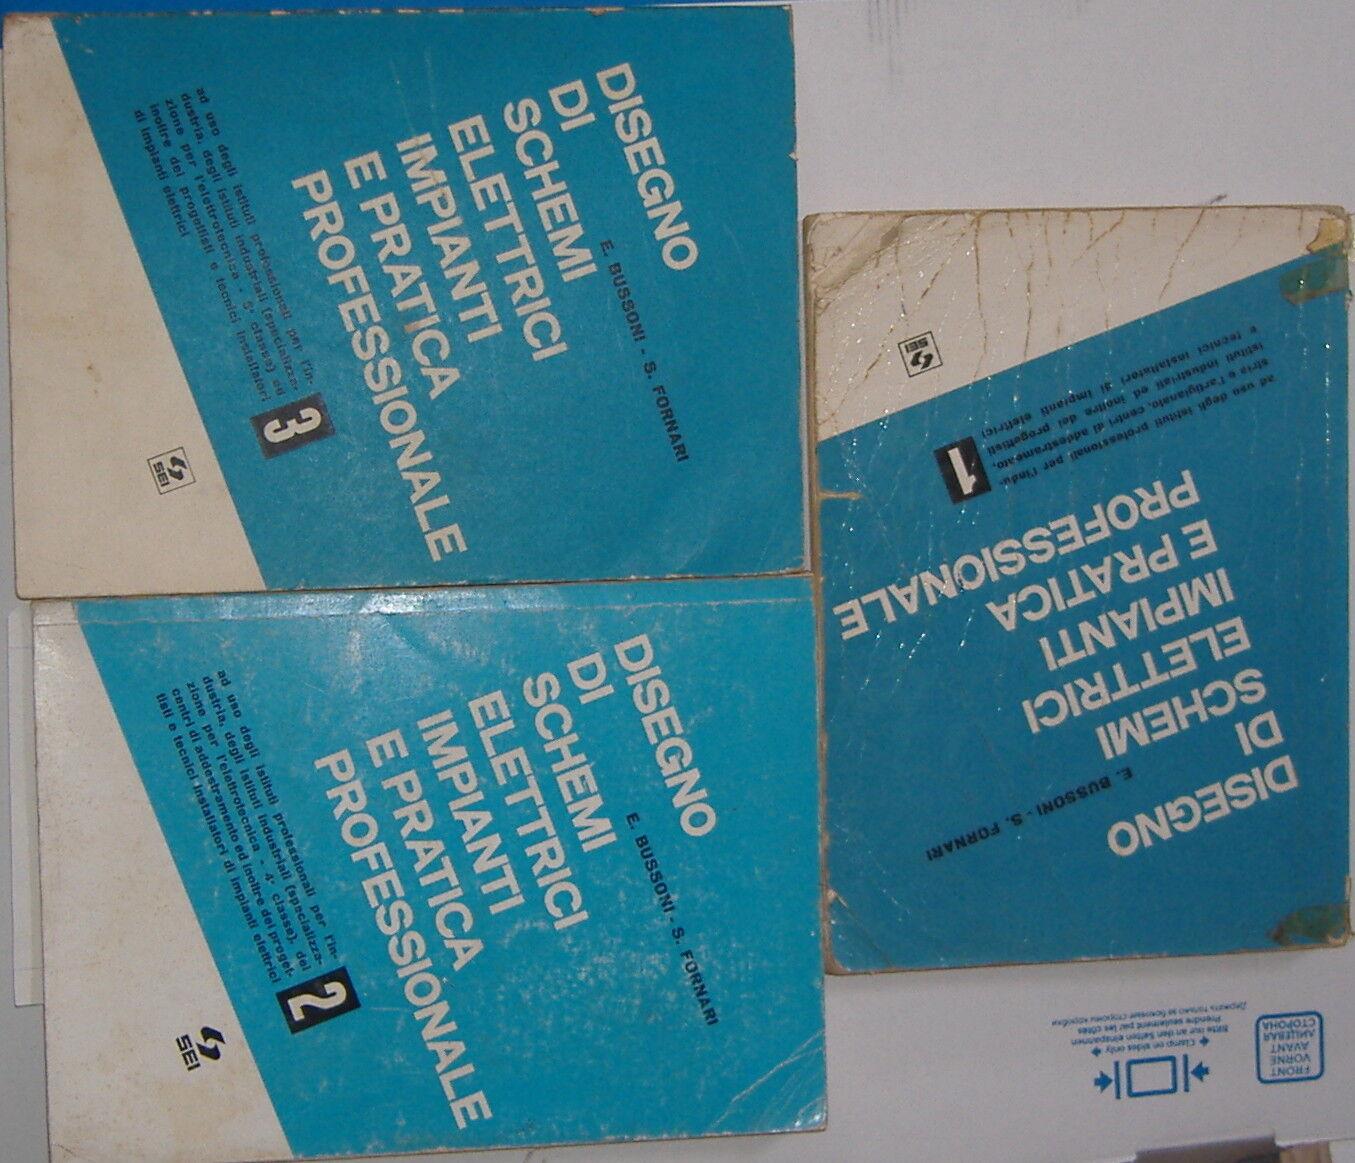 Schemi Elettrici Per Impianti Industriali : Disegno di schemi elettrici impianti e pratica professionale vol